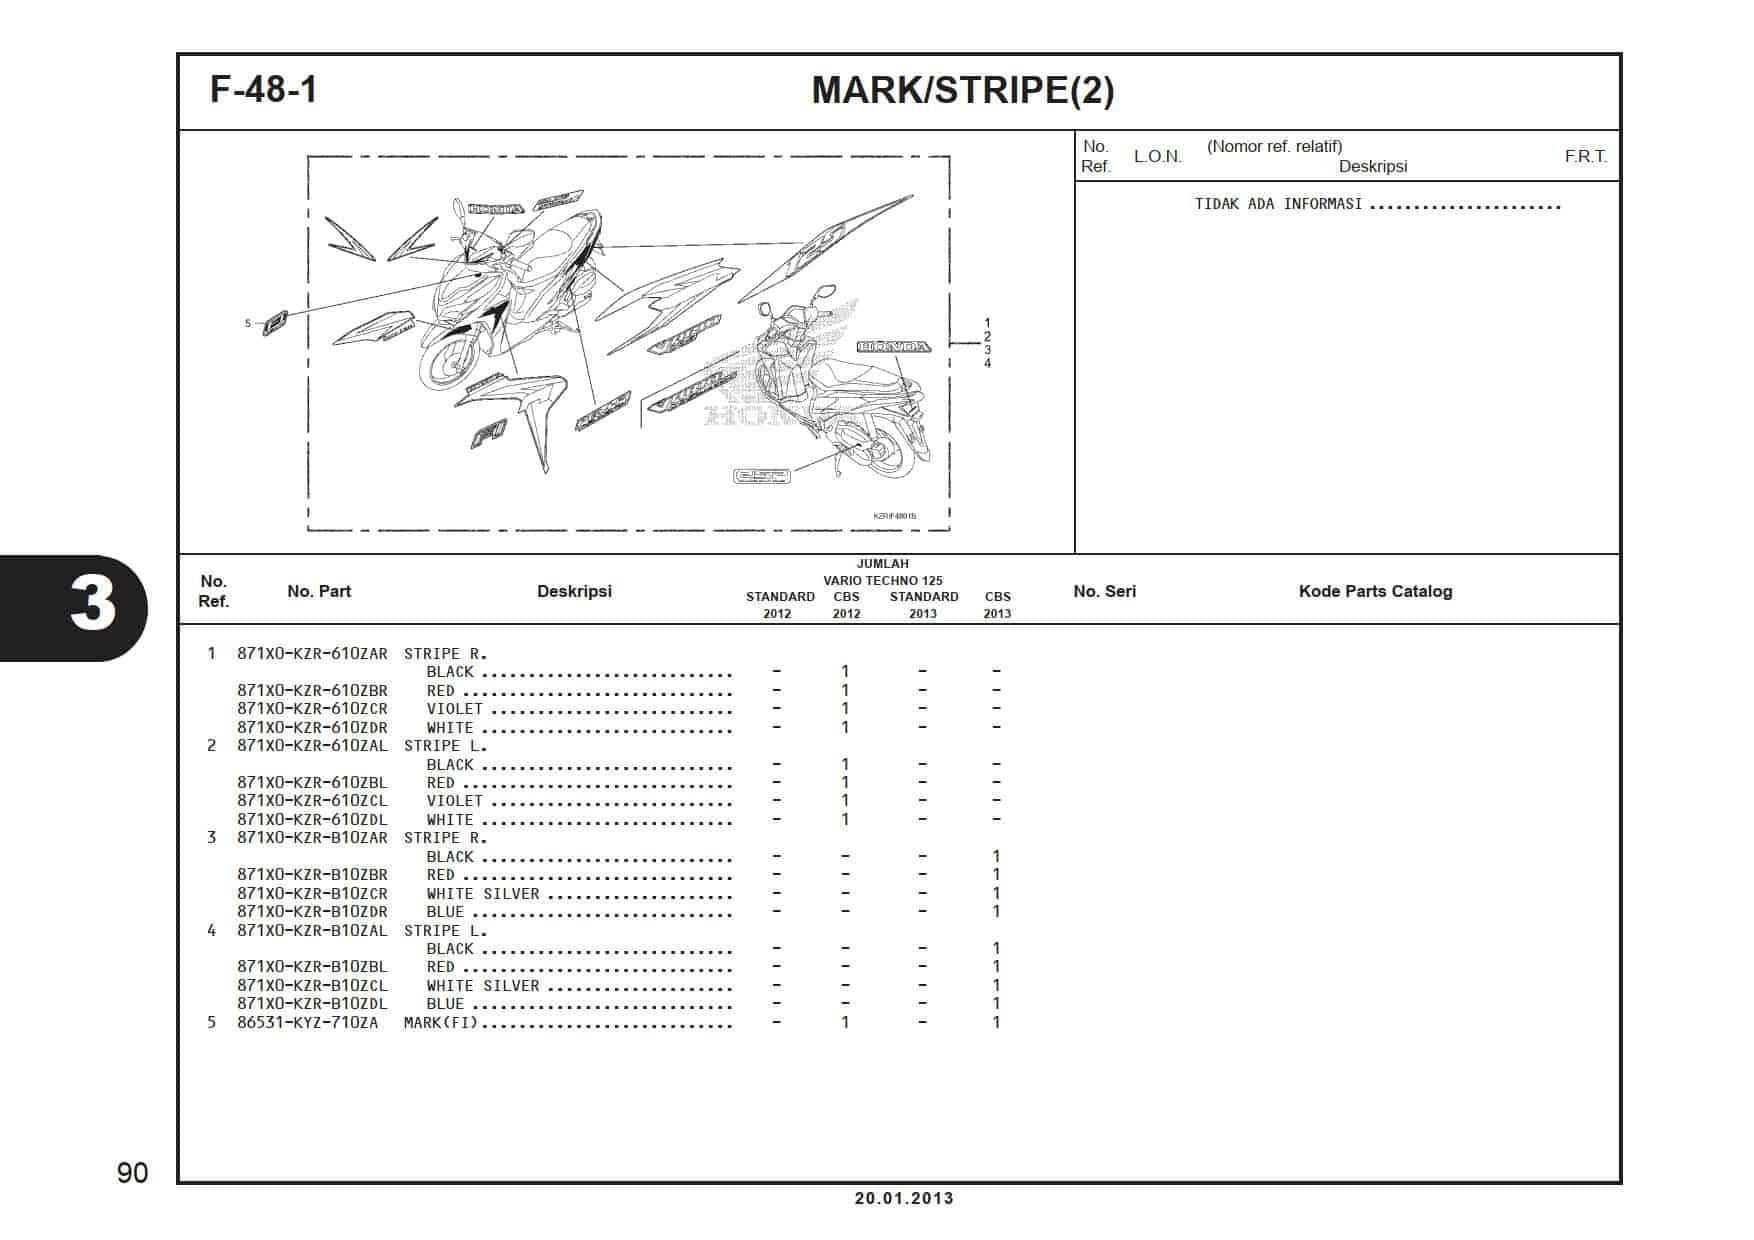 F-48-1 Mark/Stripe (2)